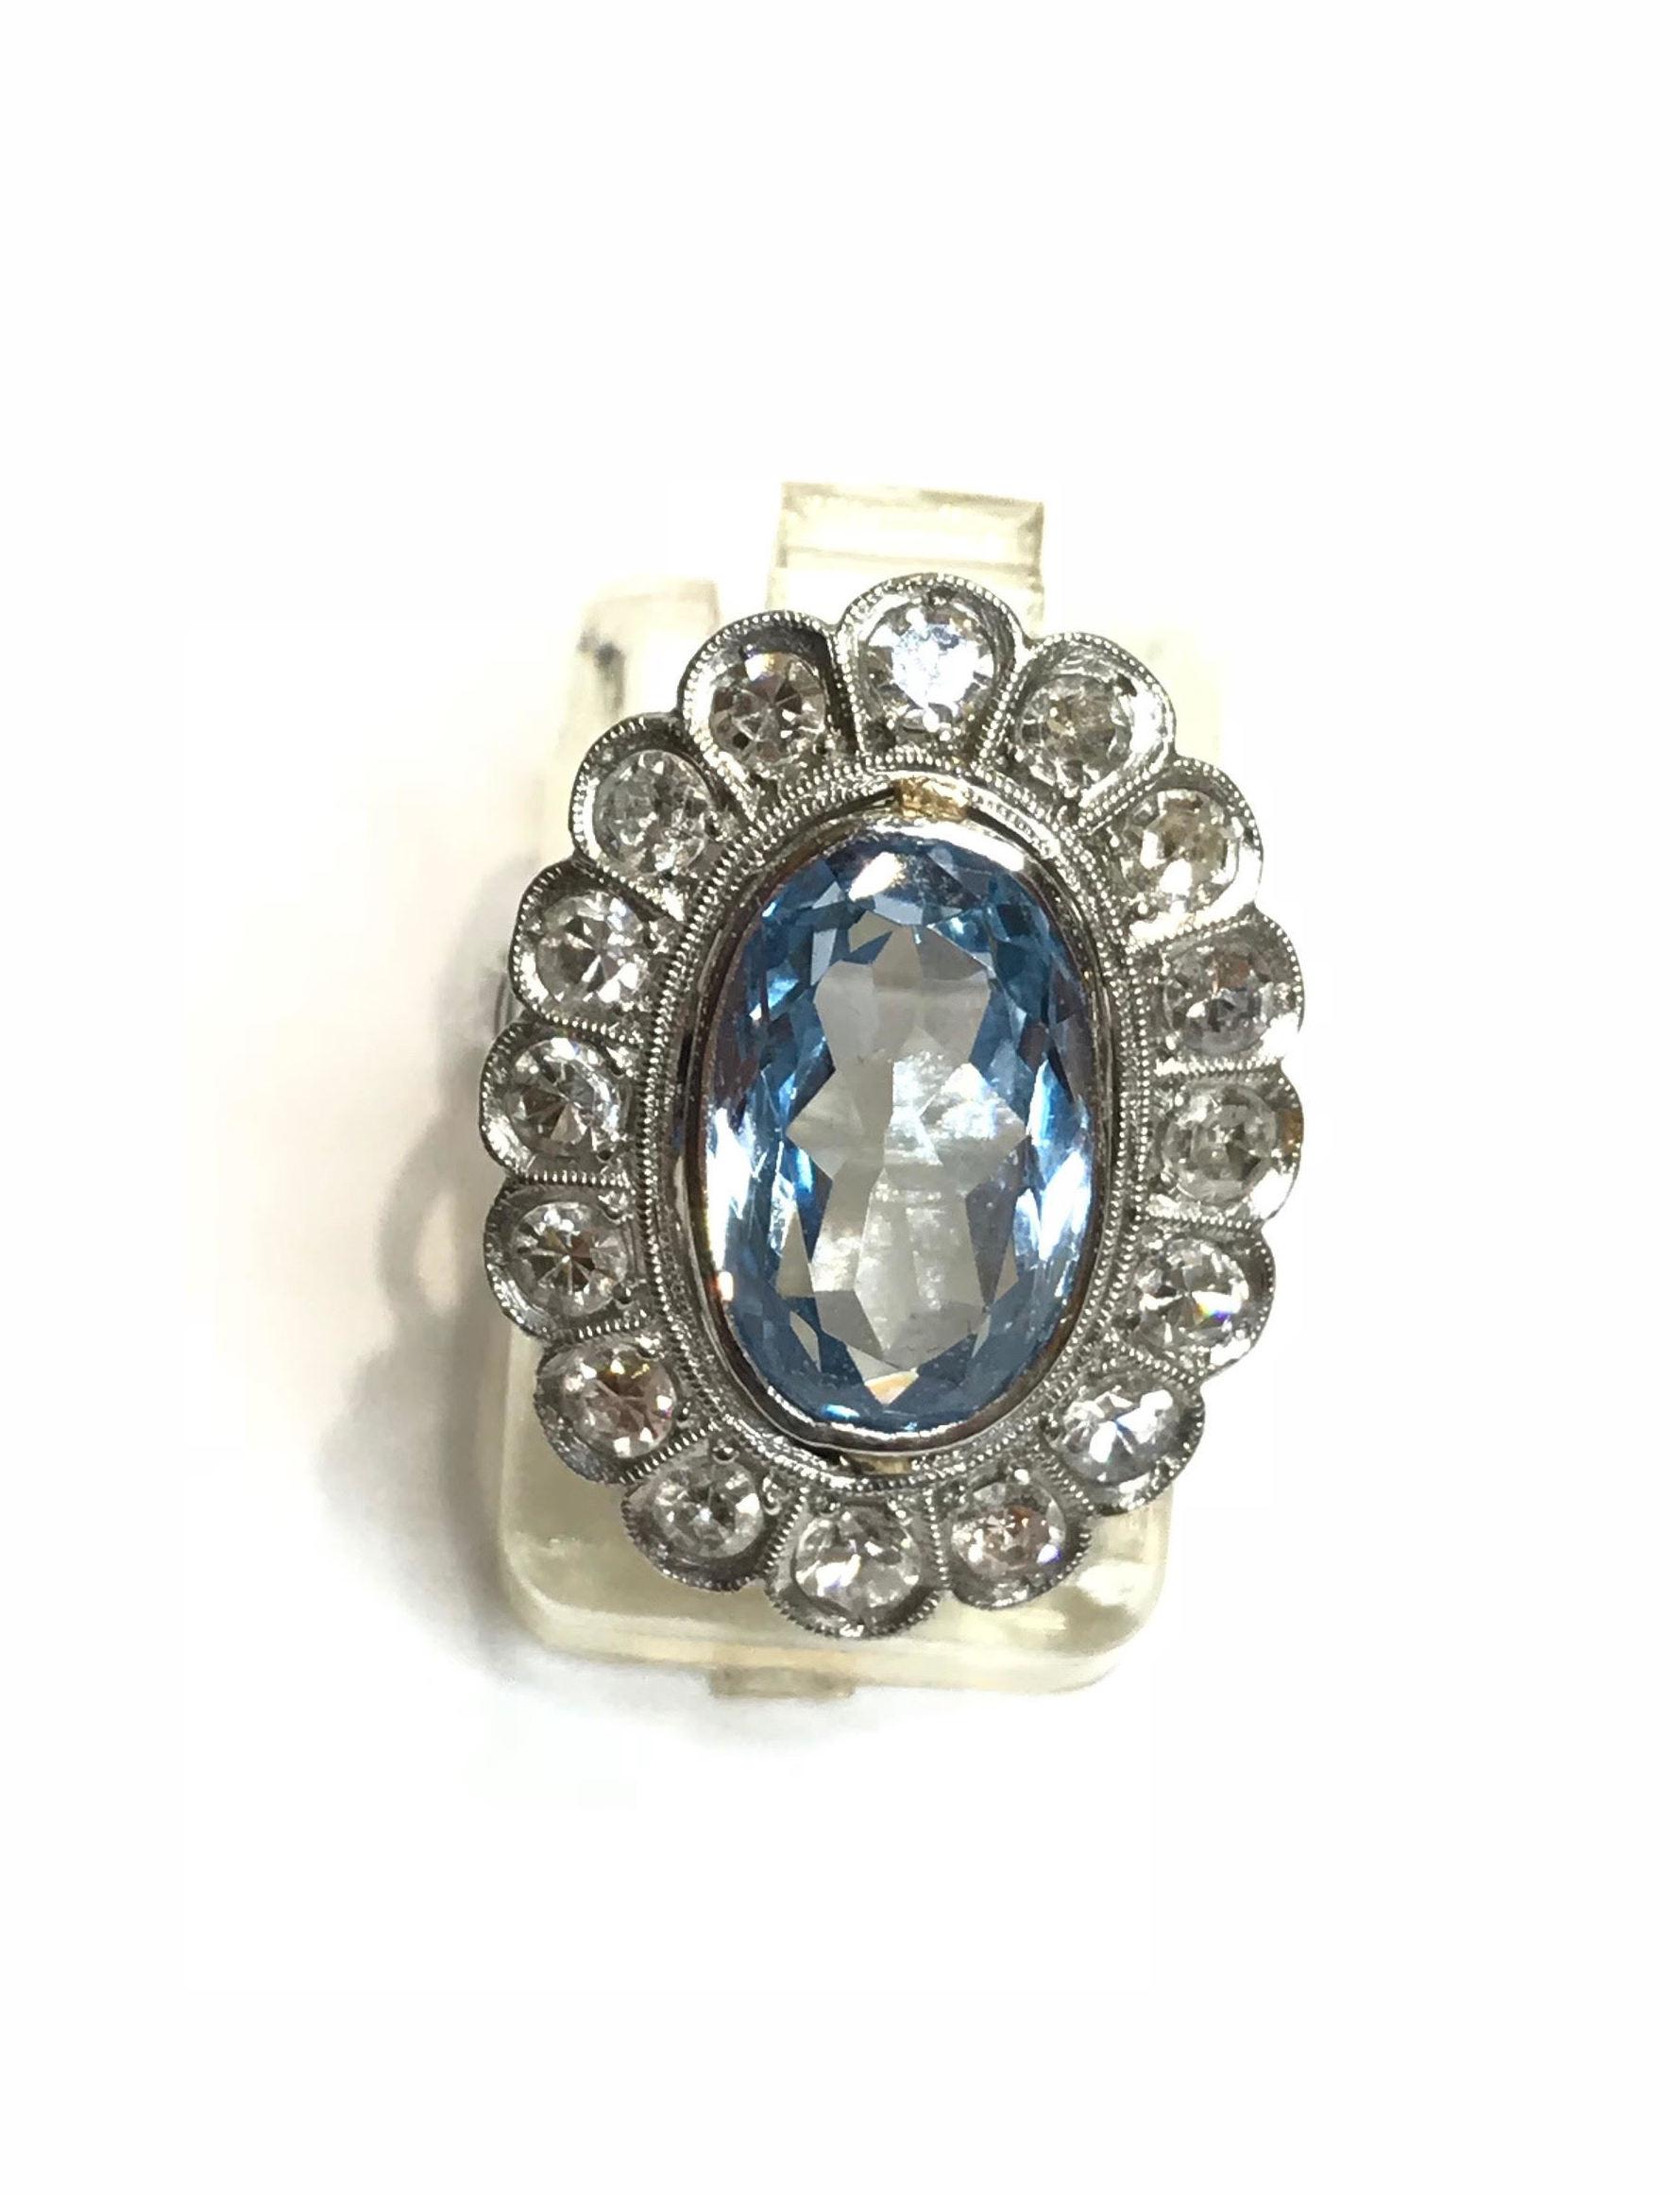 Sortija Sra. topacio azul y brillantes montada en platino.: Catálogo de Antigua Joyeros